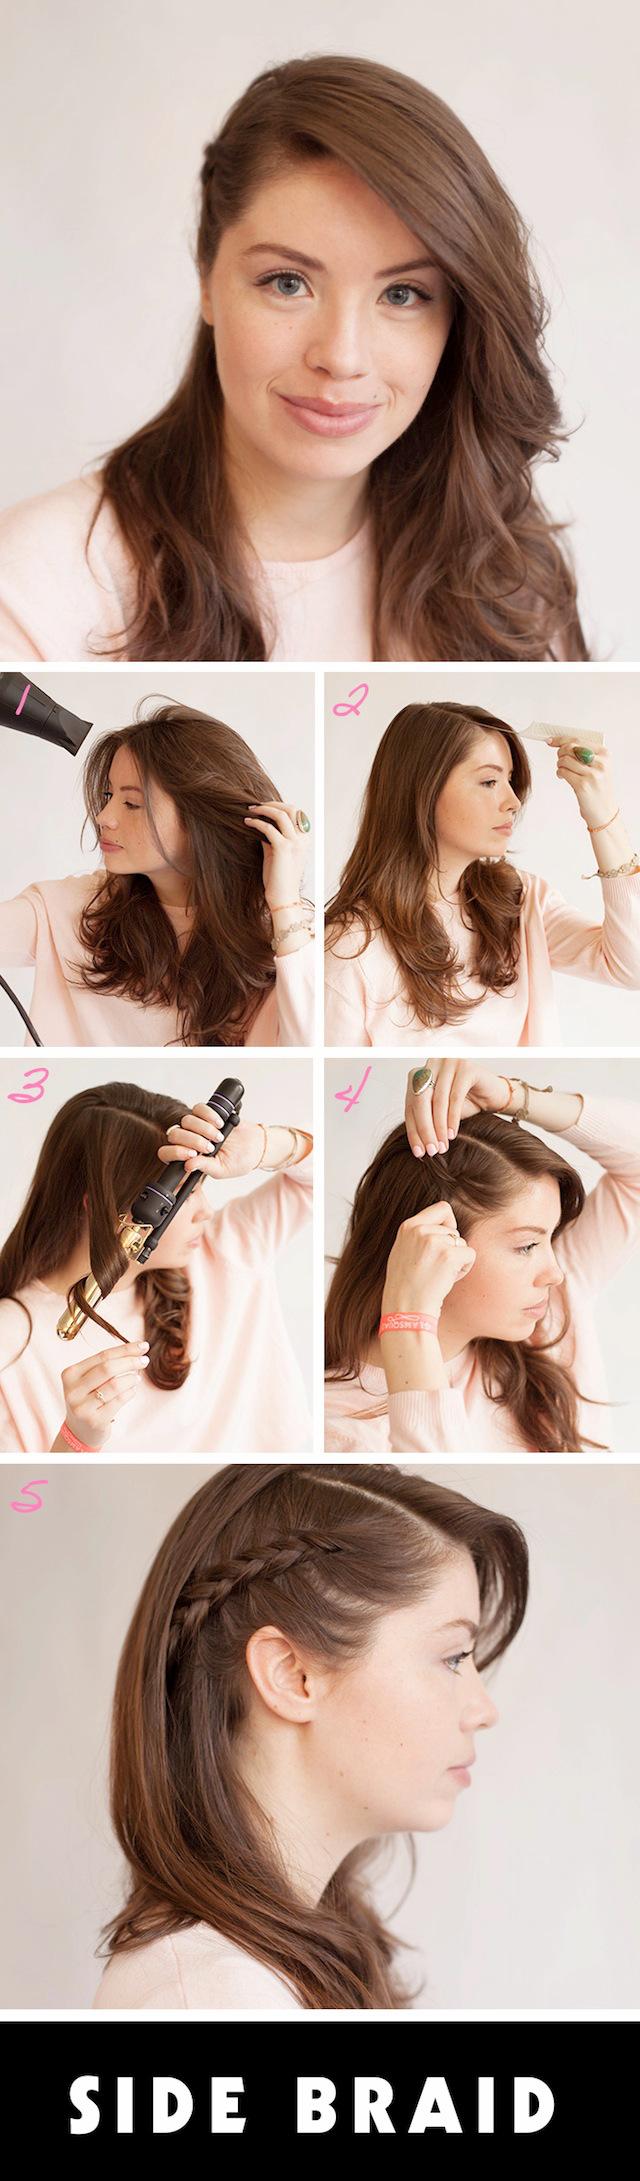 prom-hair_side-braid-1.jpg